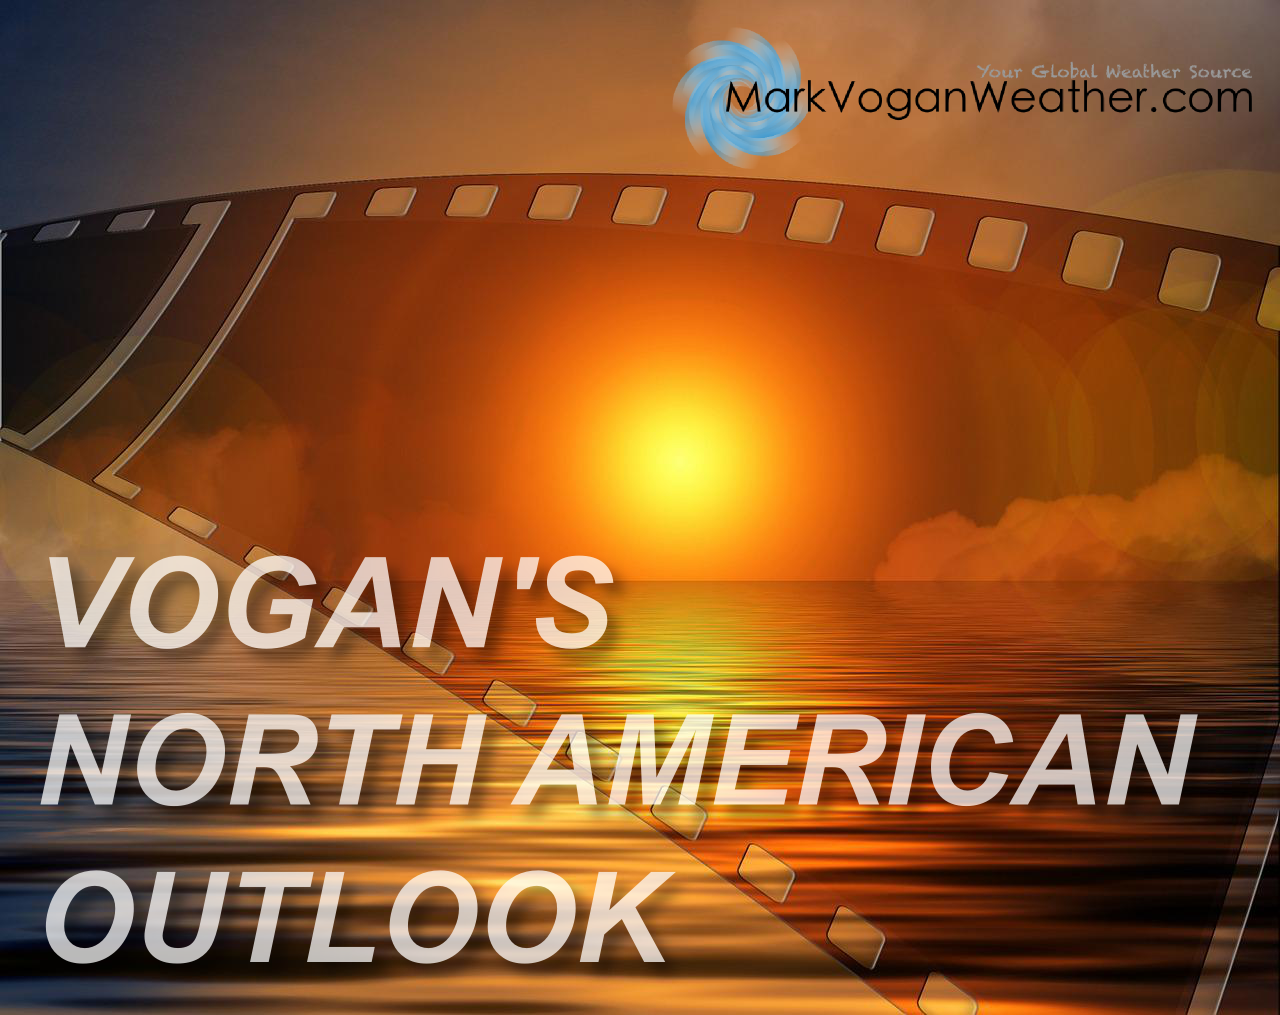 SUN 13 JUL: VOGAN'S NORTH AMERICAN OUTLOOK